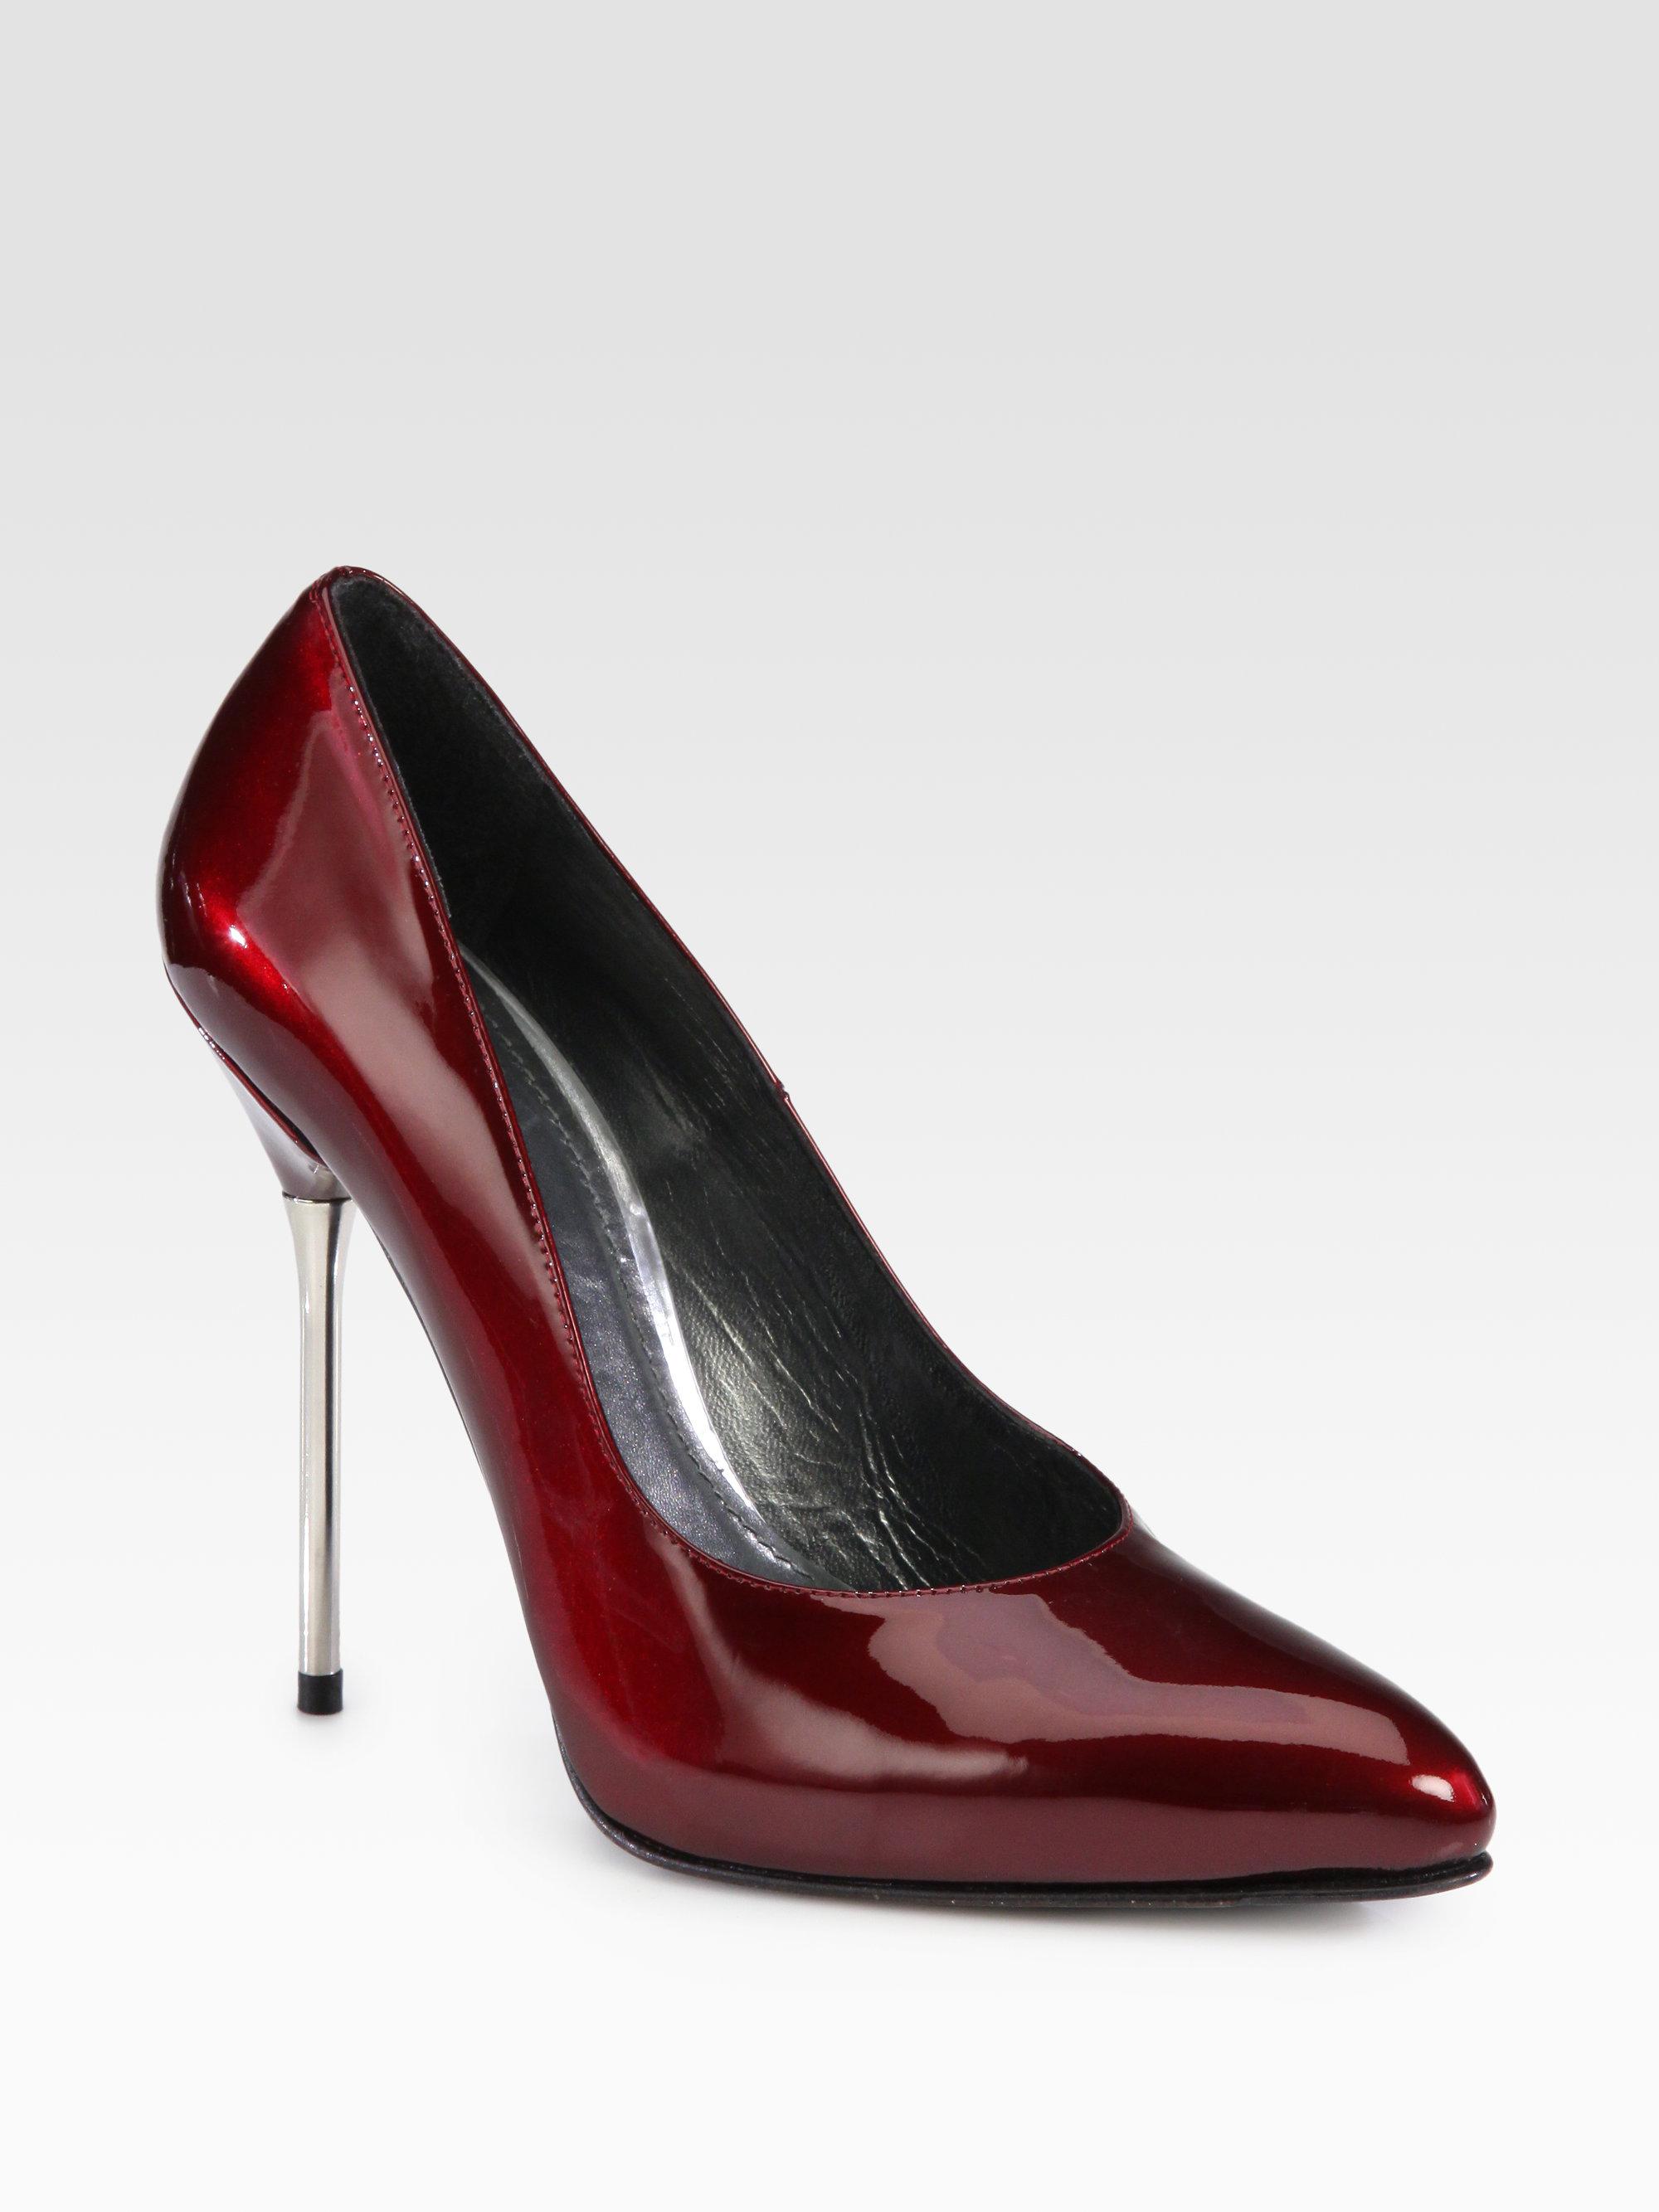 fb8731282ea Lyst - Stuart Weitzman Dagger Patent Leather Metal Heel Pumps in Red